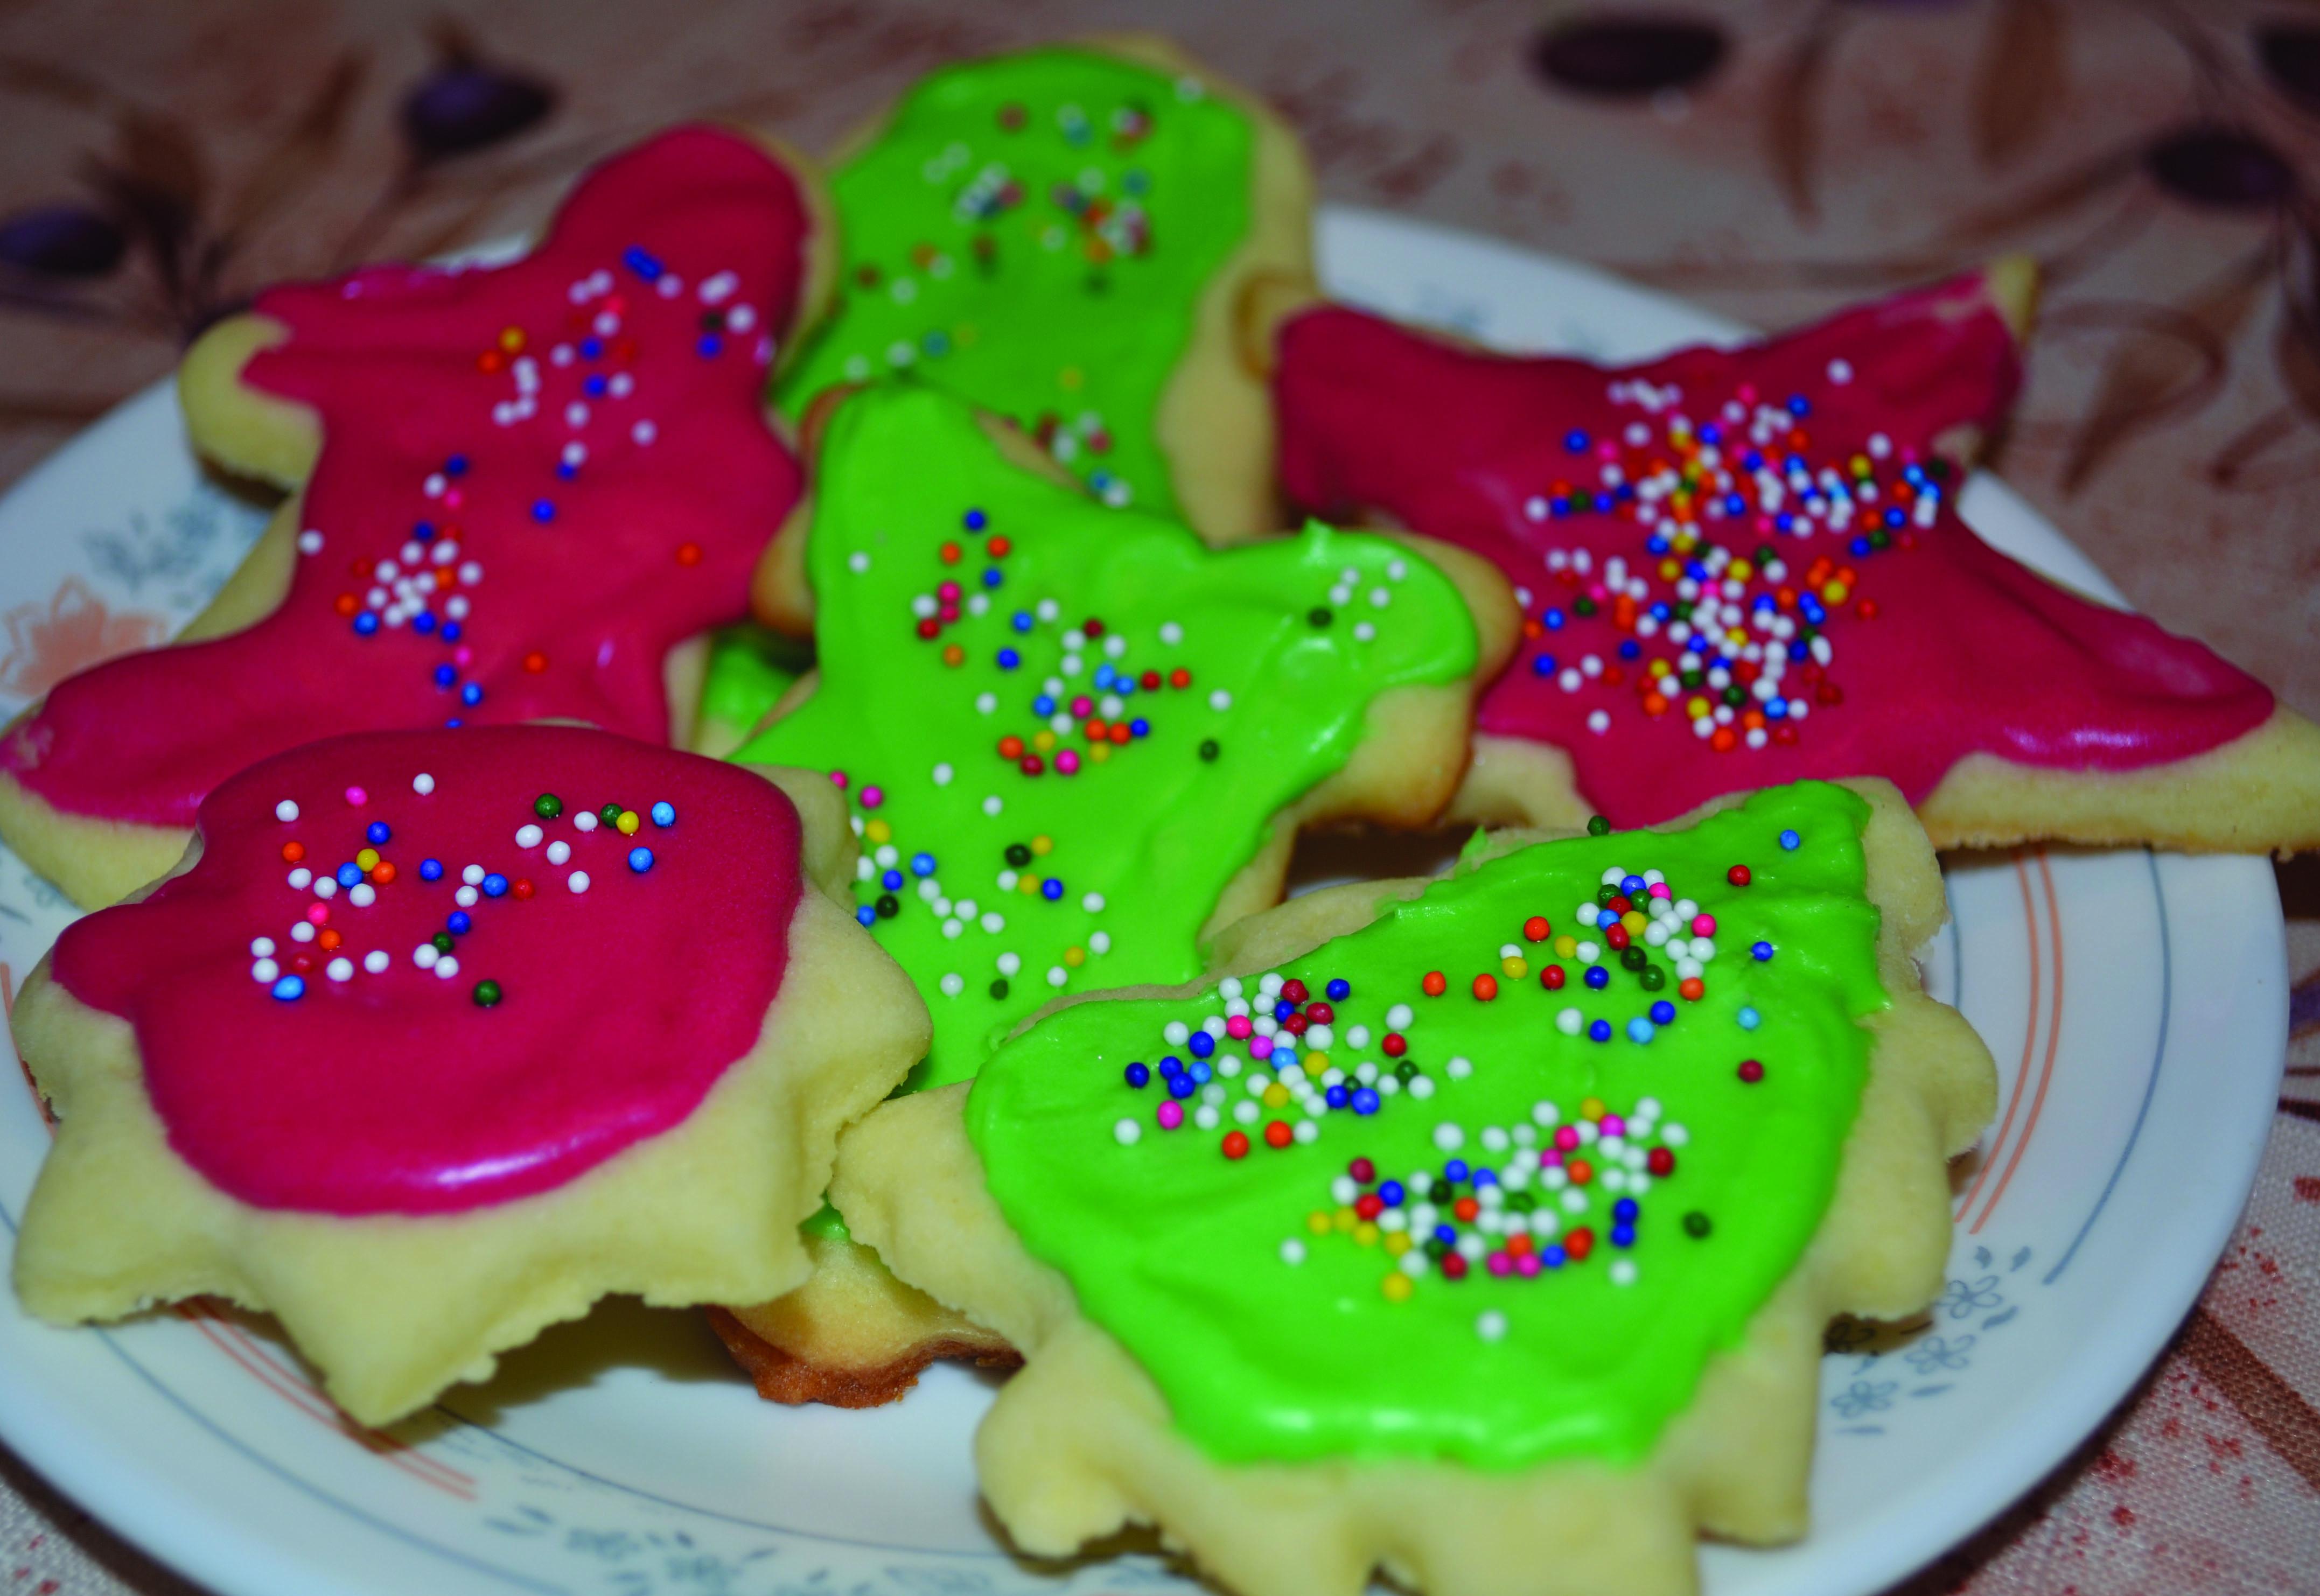 Christmas Baking: Sugar Cookies | Rural Route Ramblings